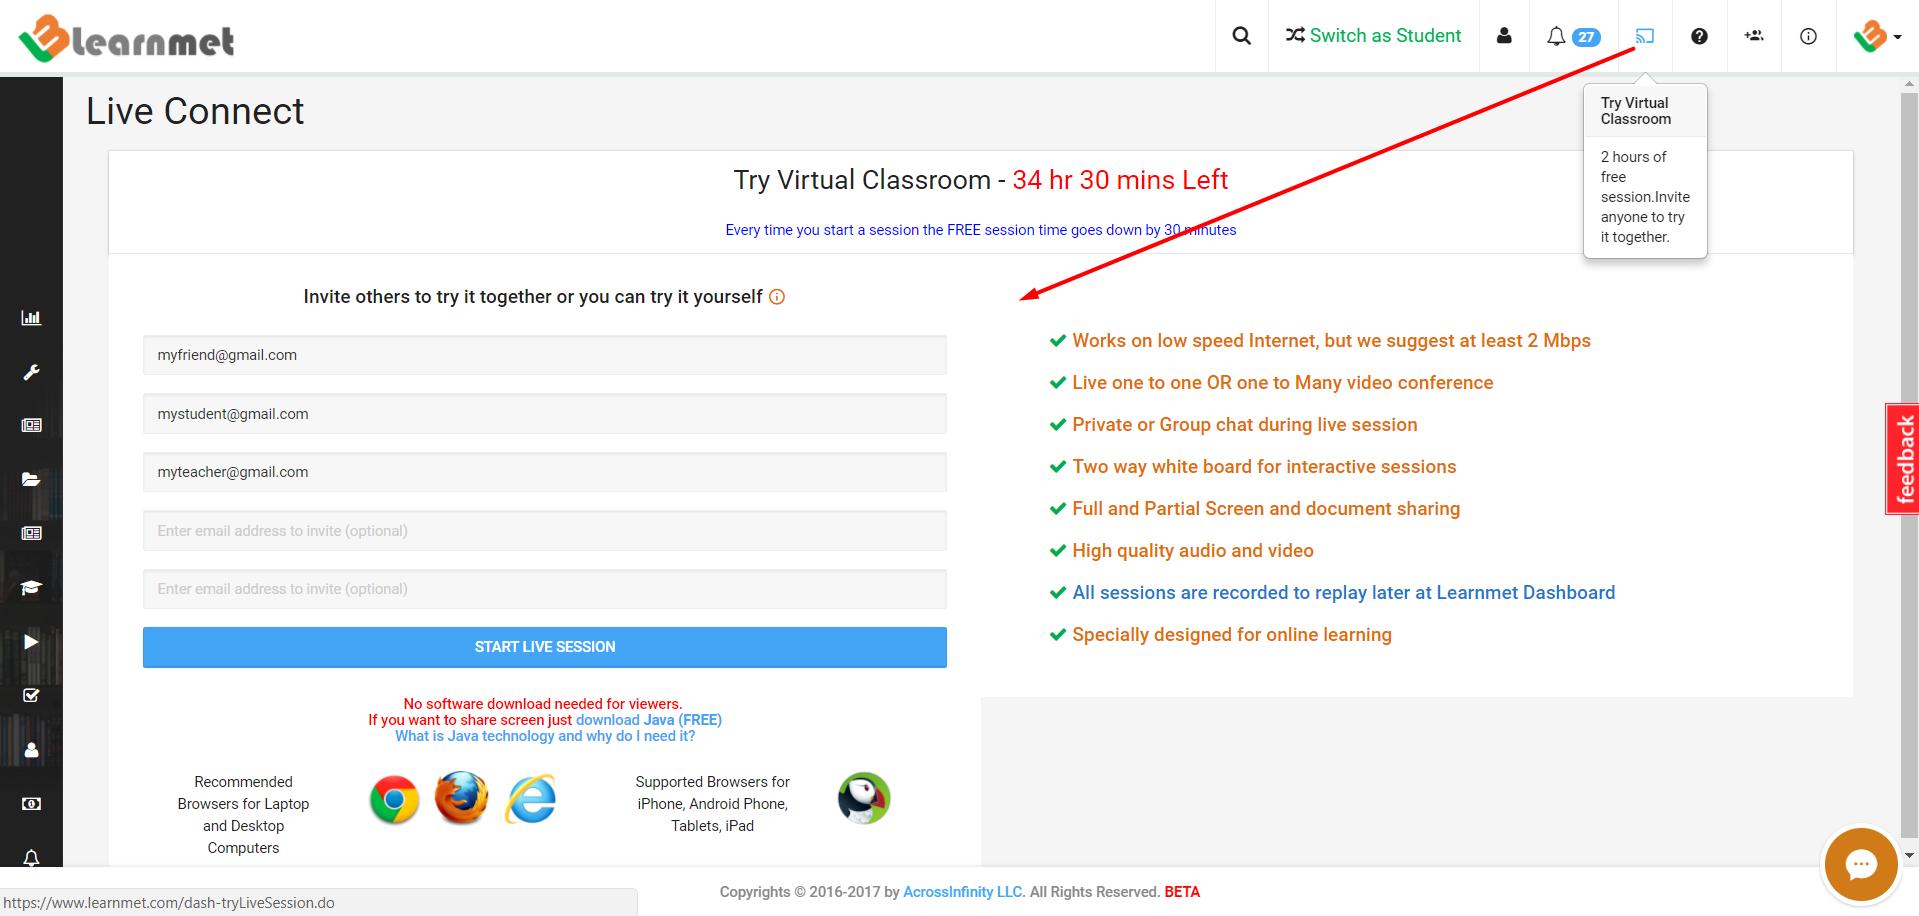 Learnmet Virtual Classroom